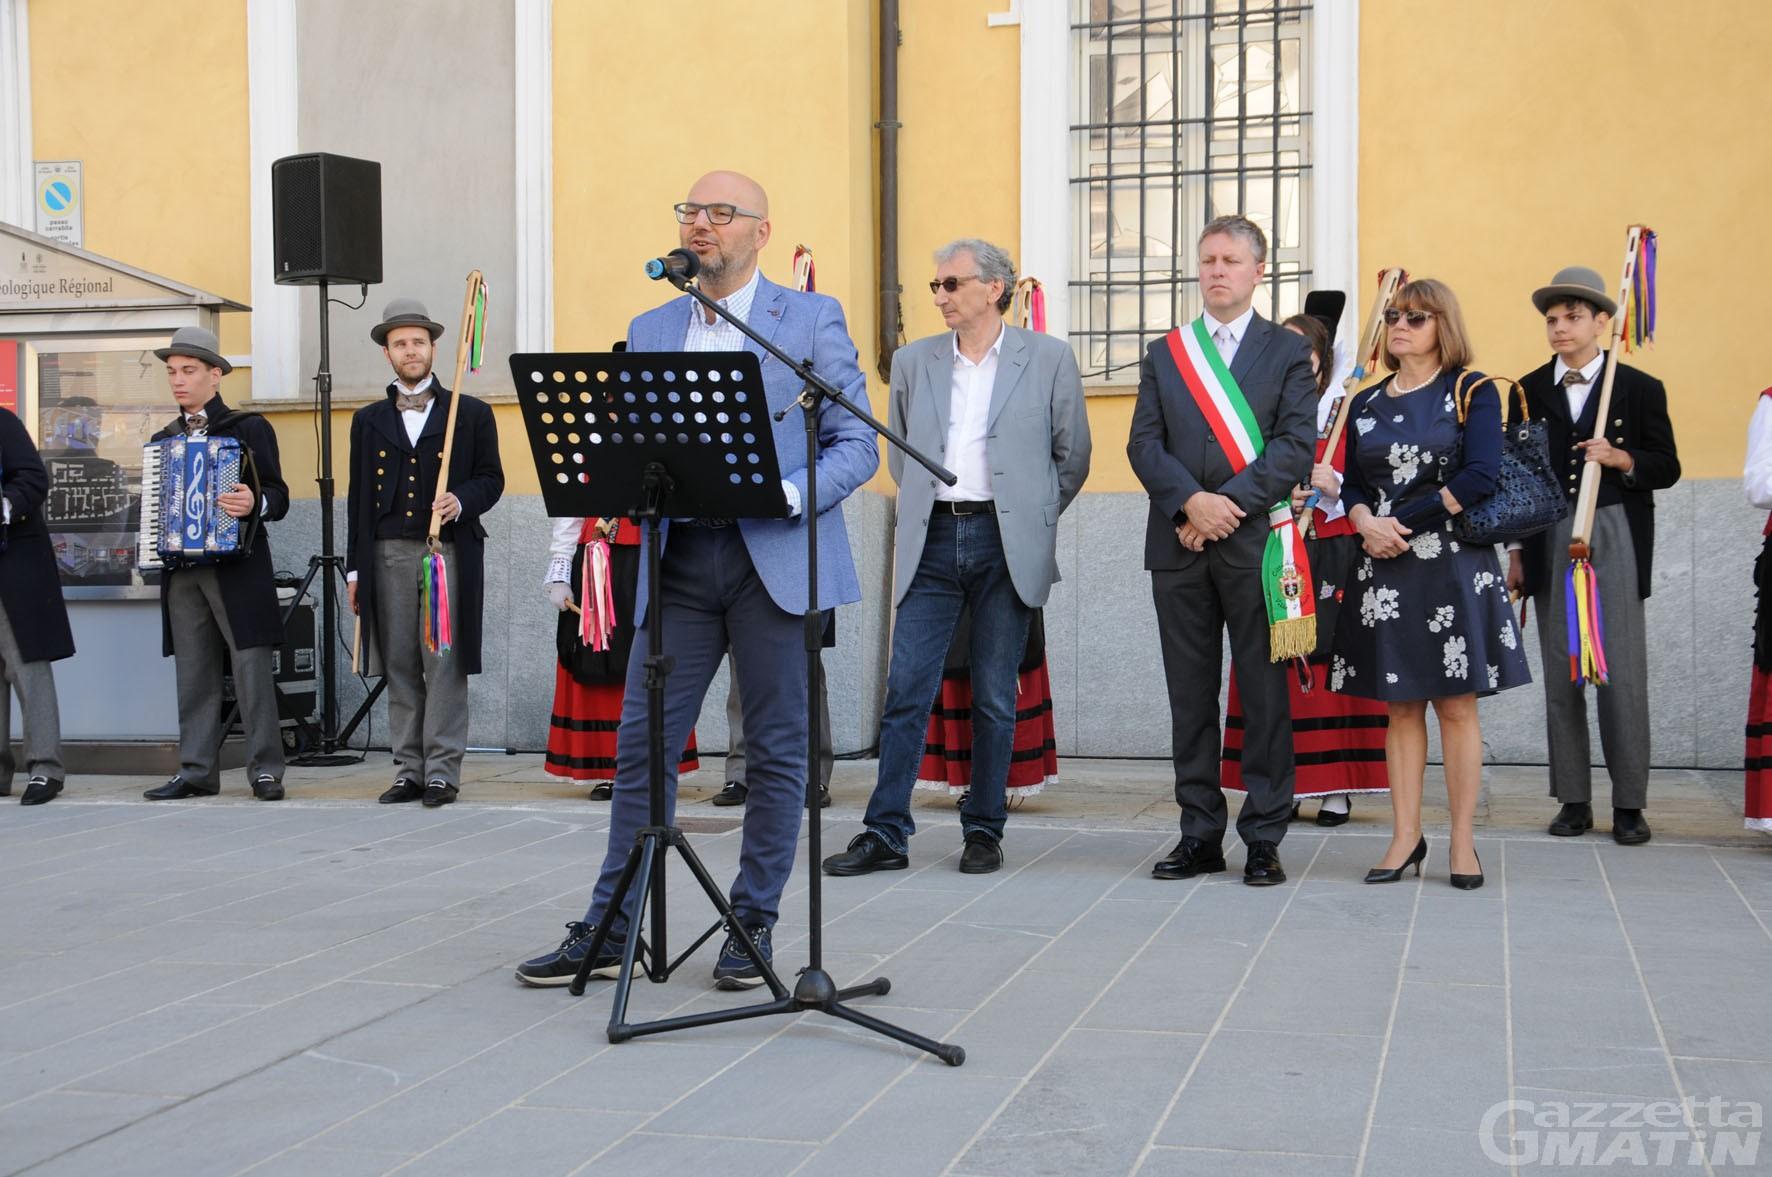 Aosta, Piazza Roncas restituita ai cittadini